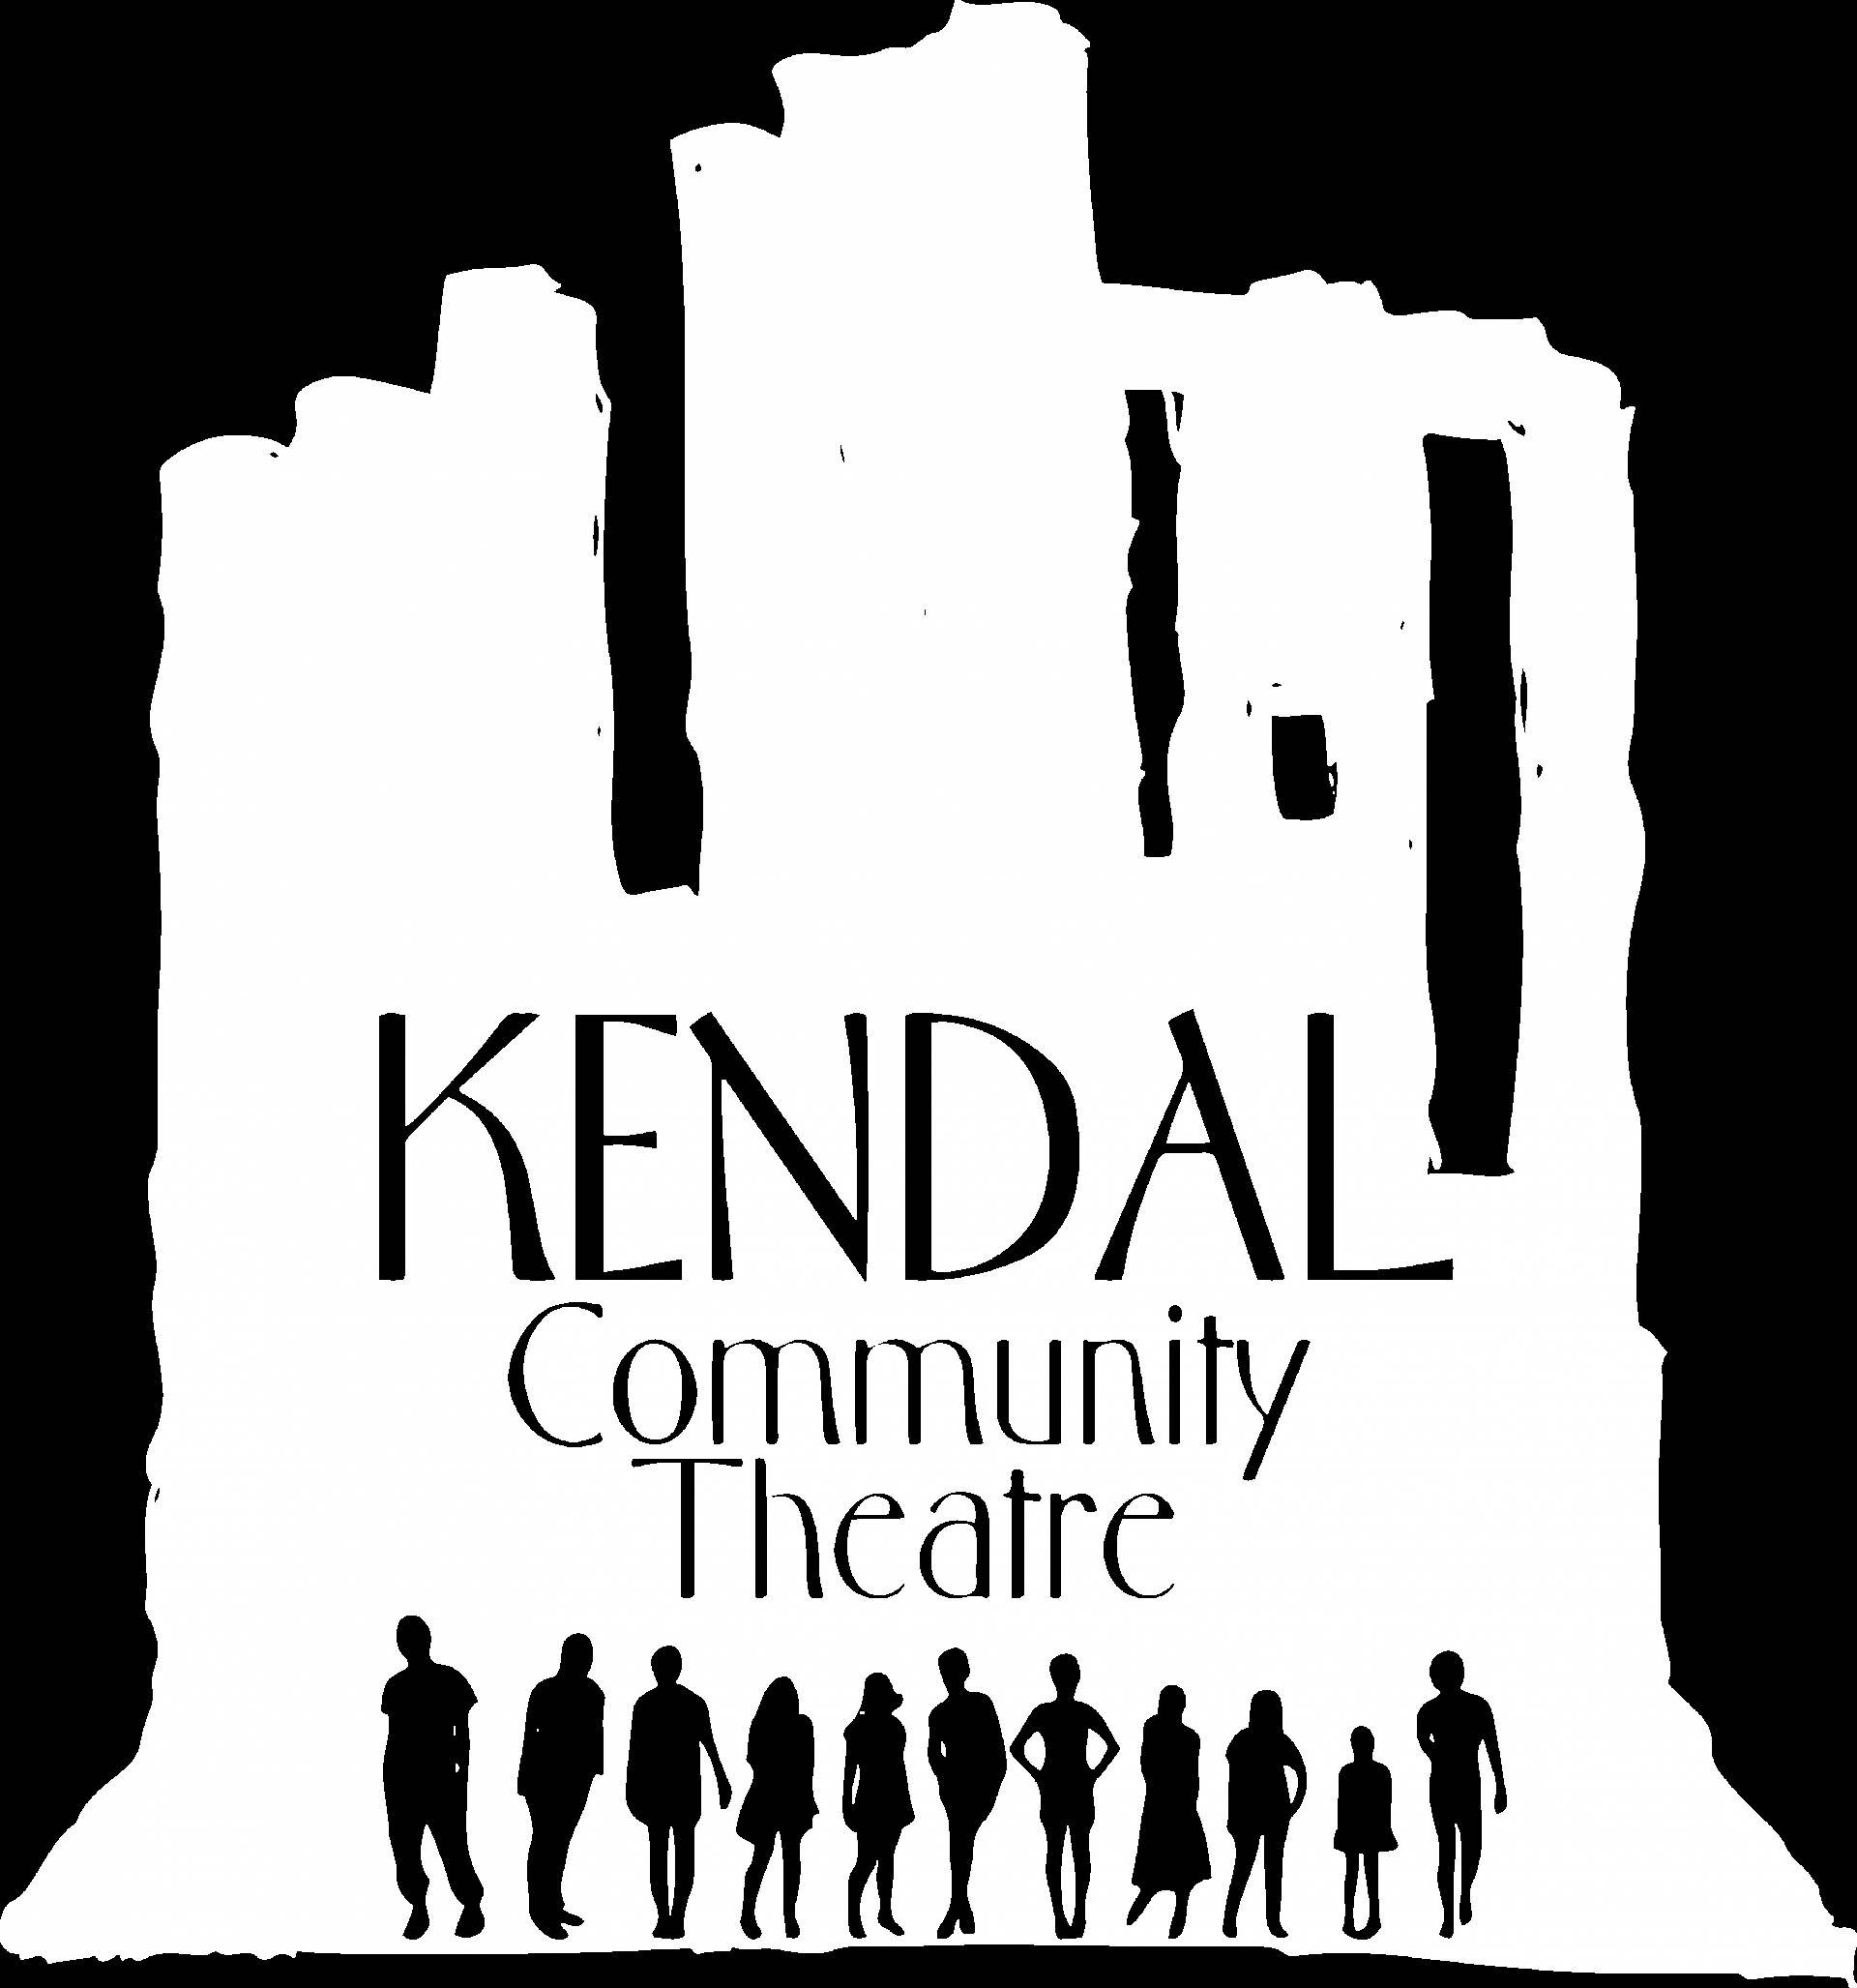 Kendalcommunitytheatre